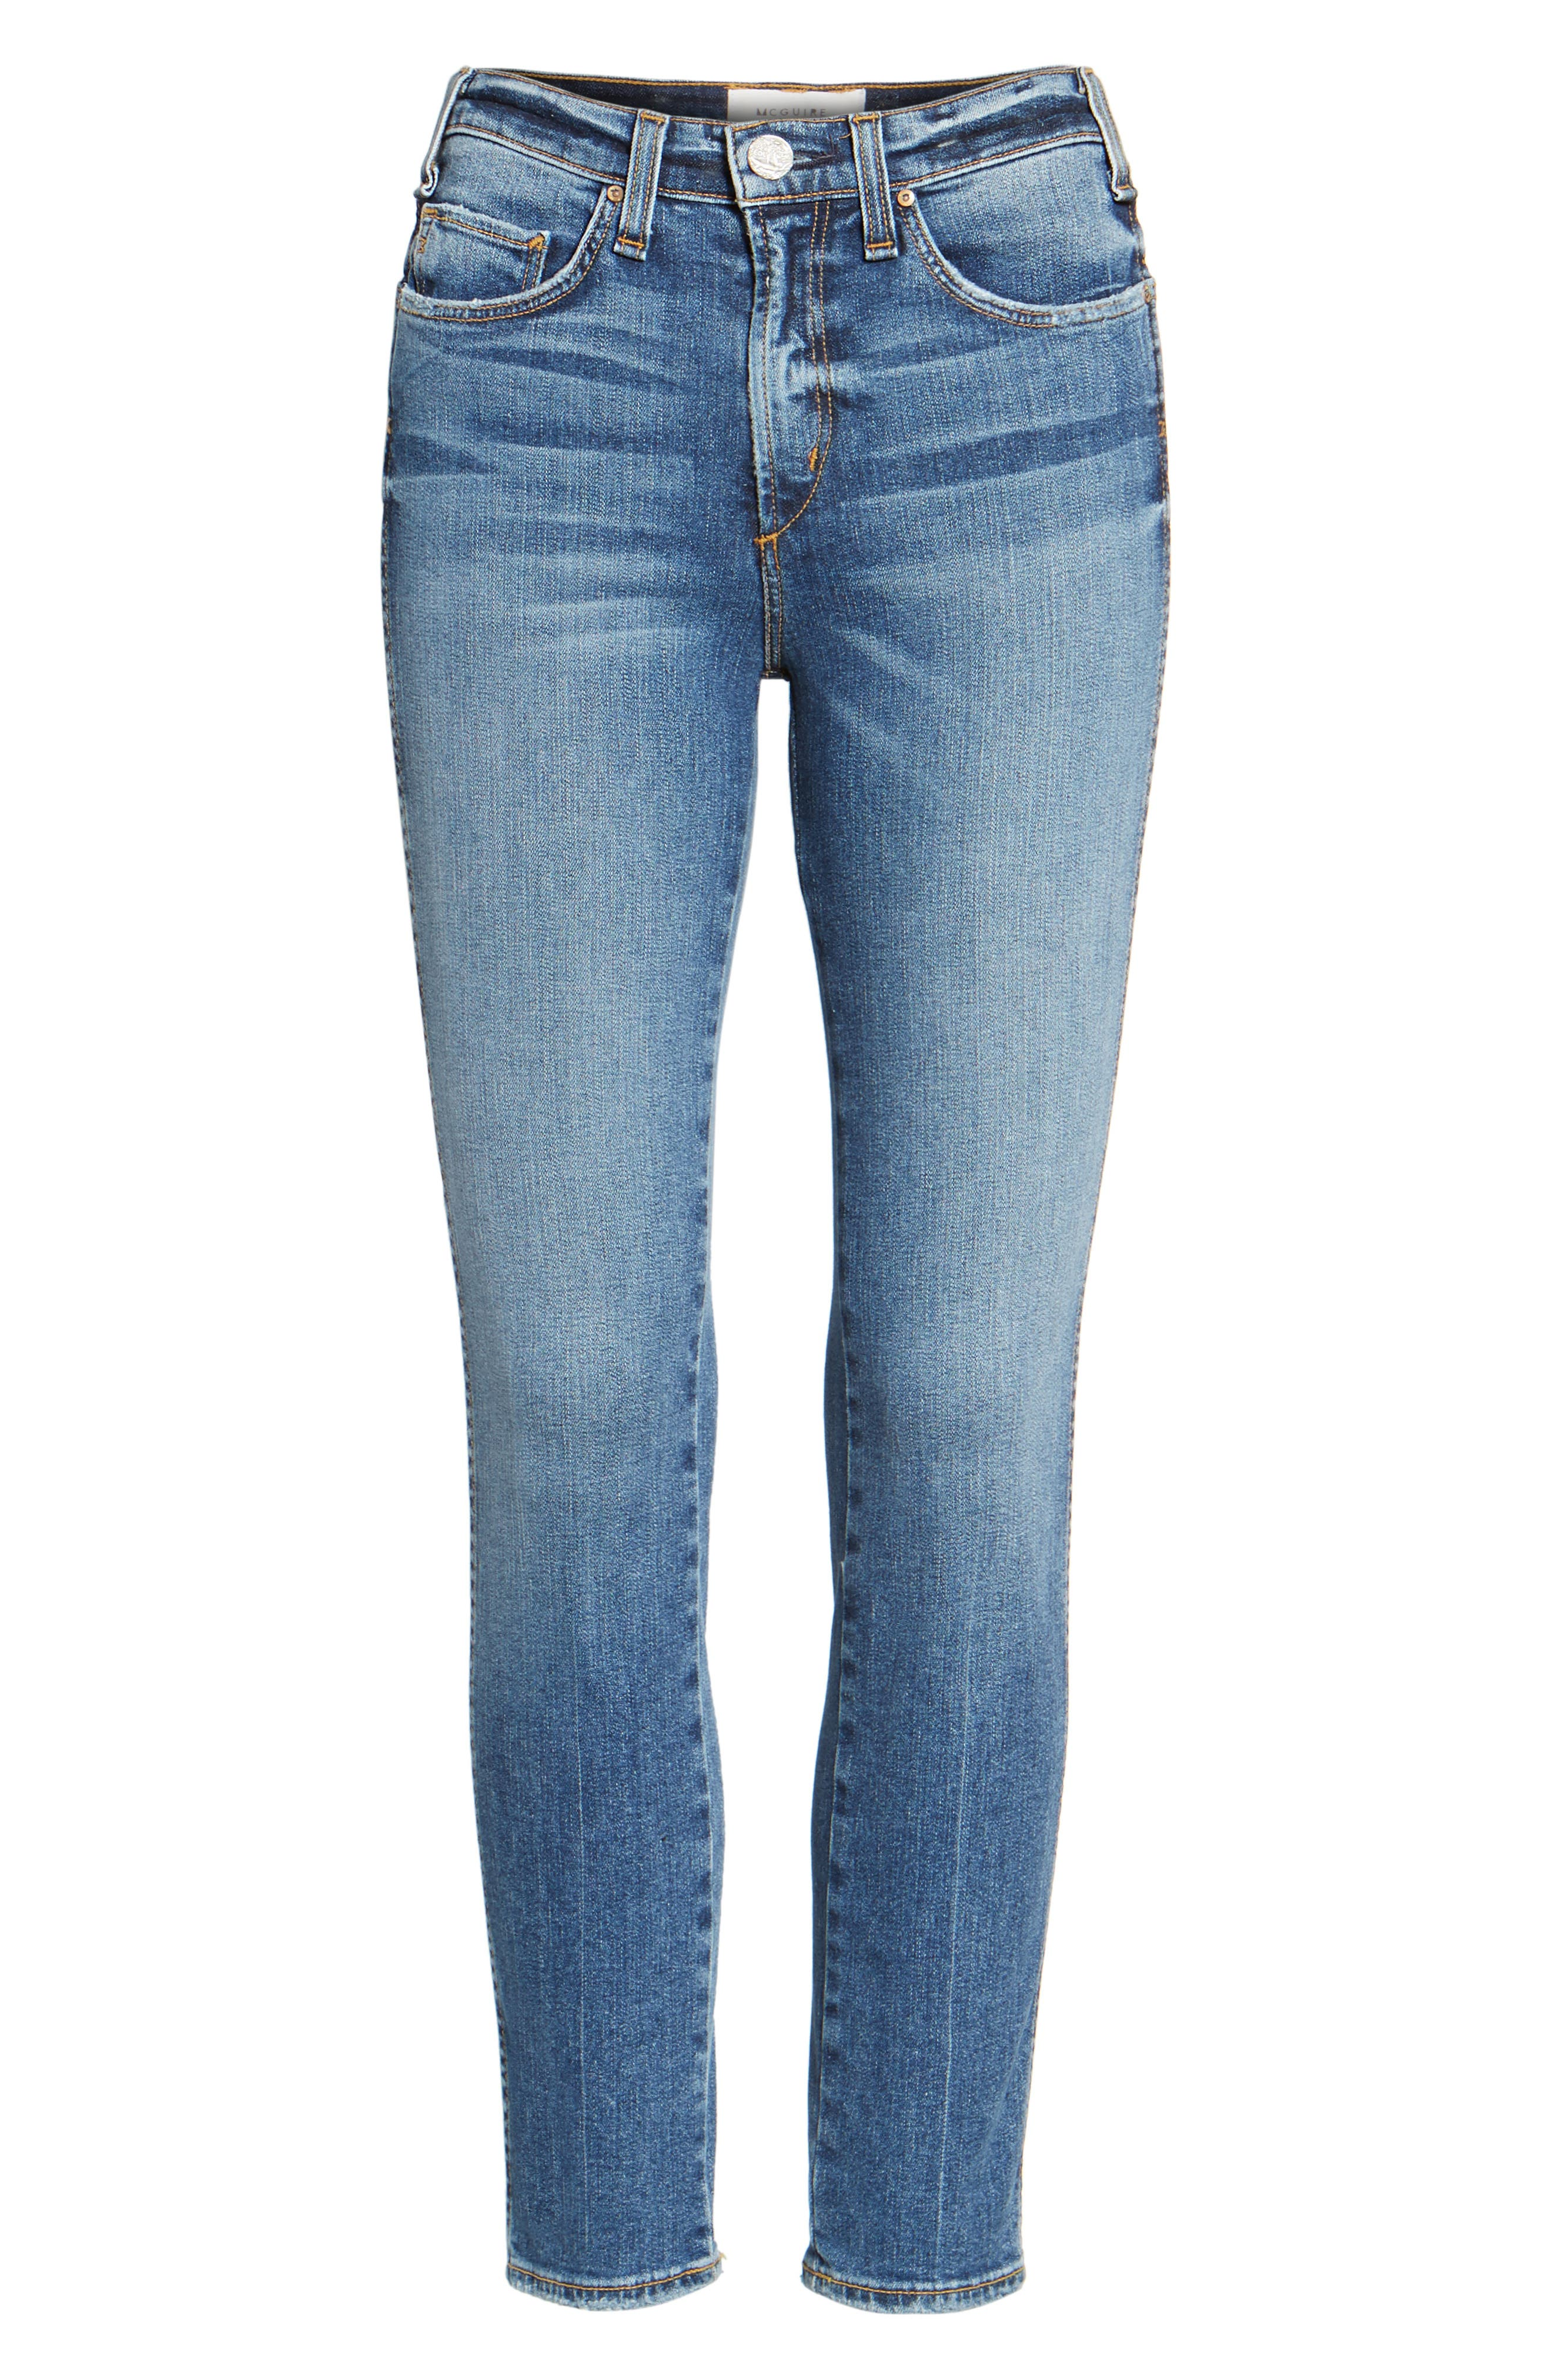 Windsor Destroyed High Waist Straight Leg Jeans,                             Alternate thumbnail 6, color,                             430